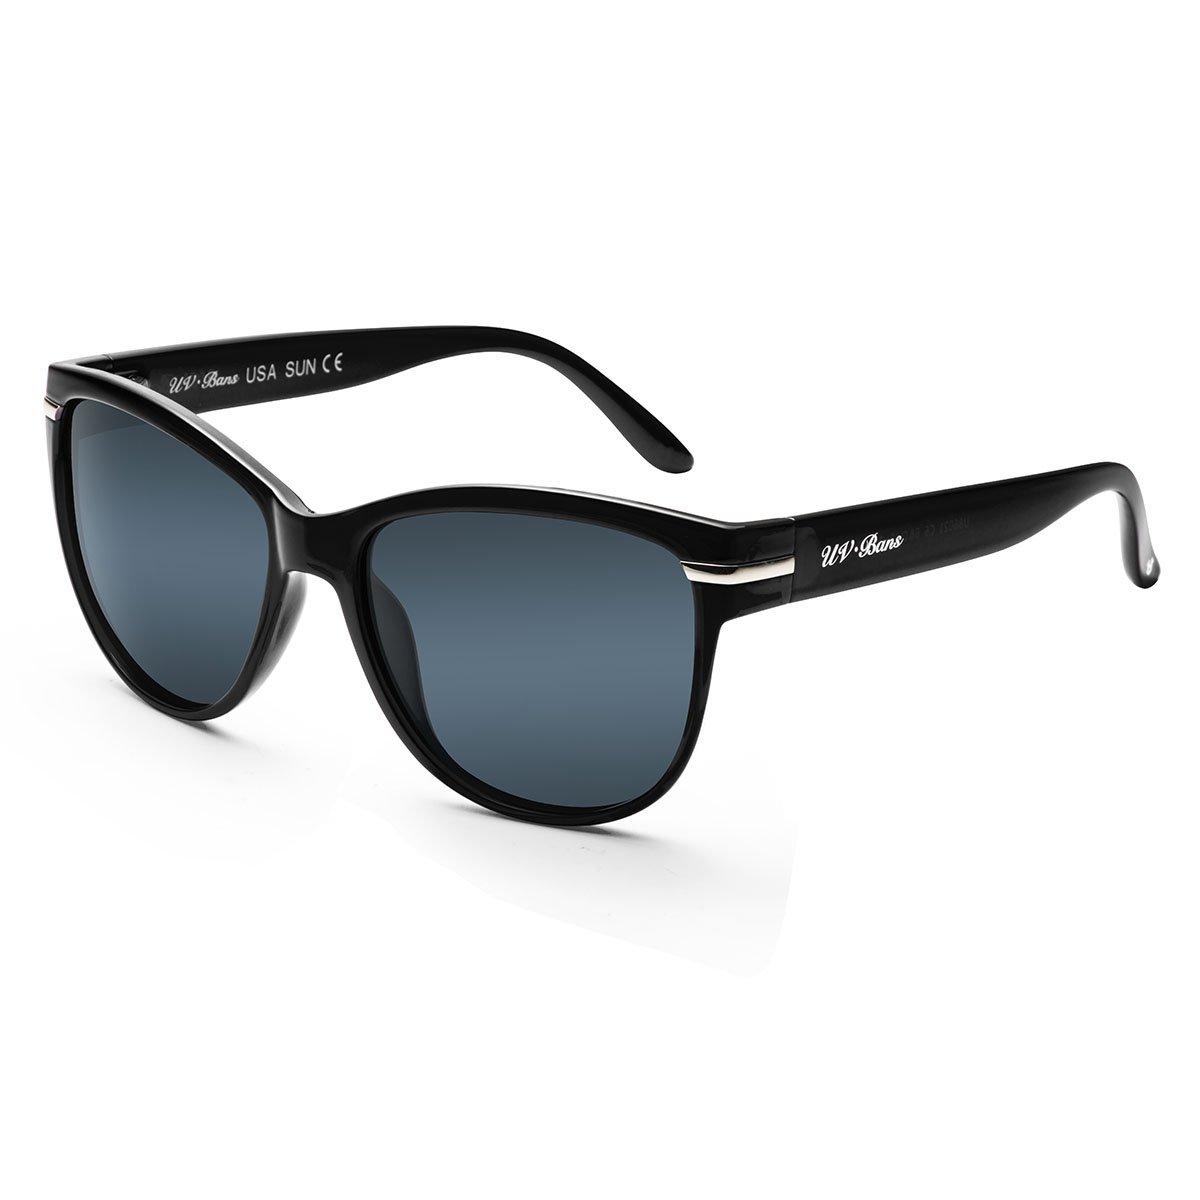 UV-BANS Women Polarized Sunglasses Classic Retro Cateye Frame 100% UV Protection (Black Frame 1, Black)